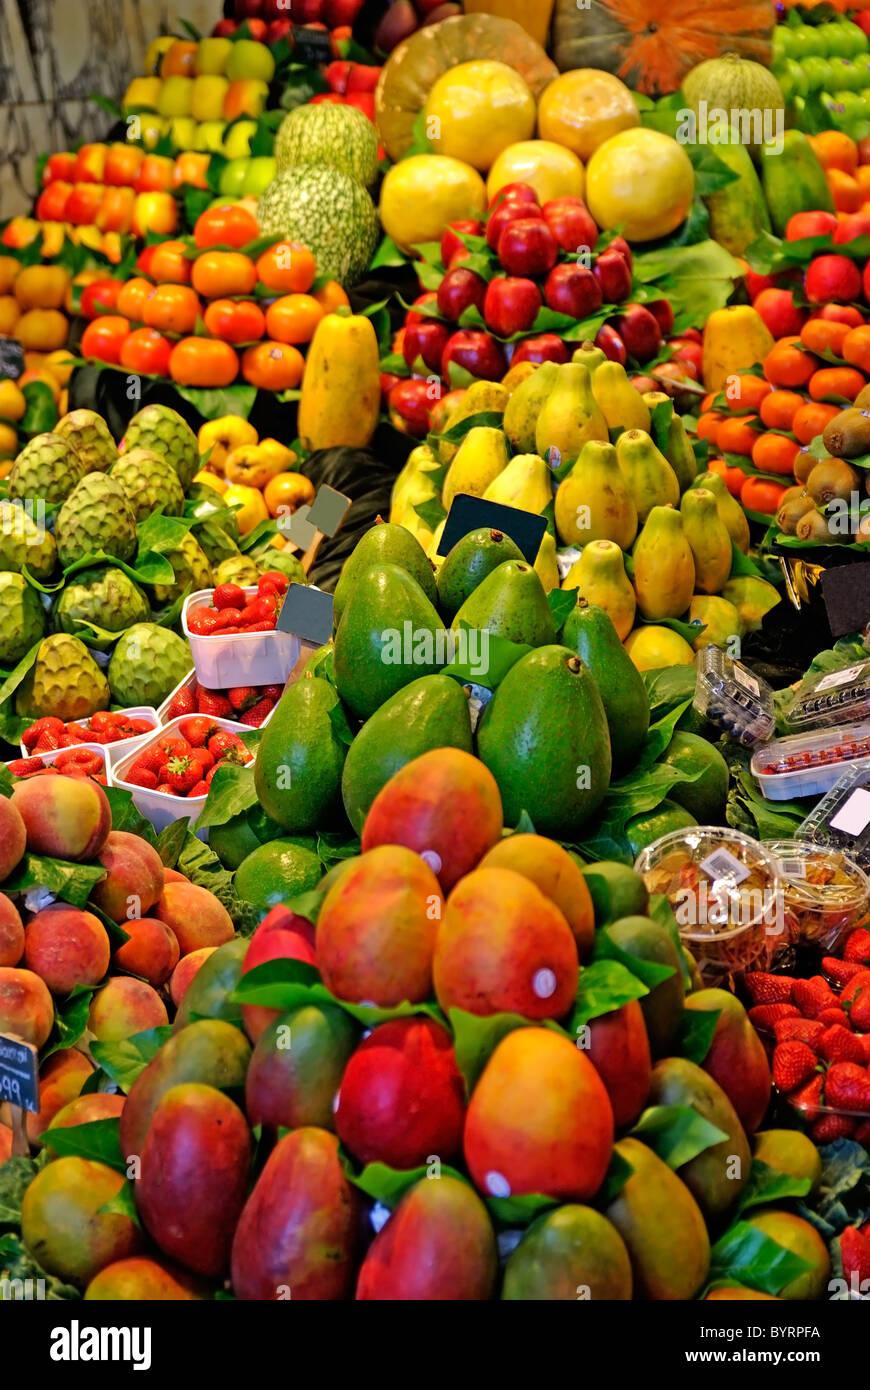 fruits world famous barcelona